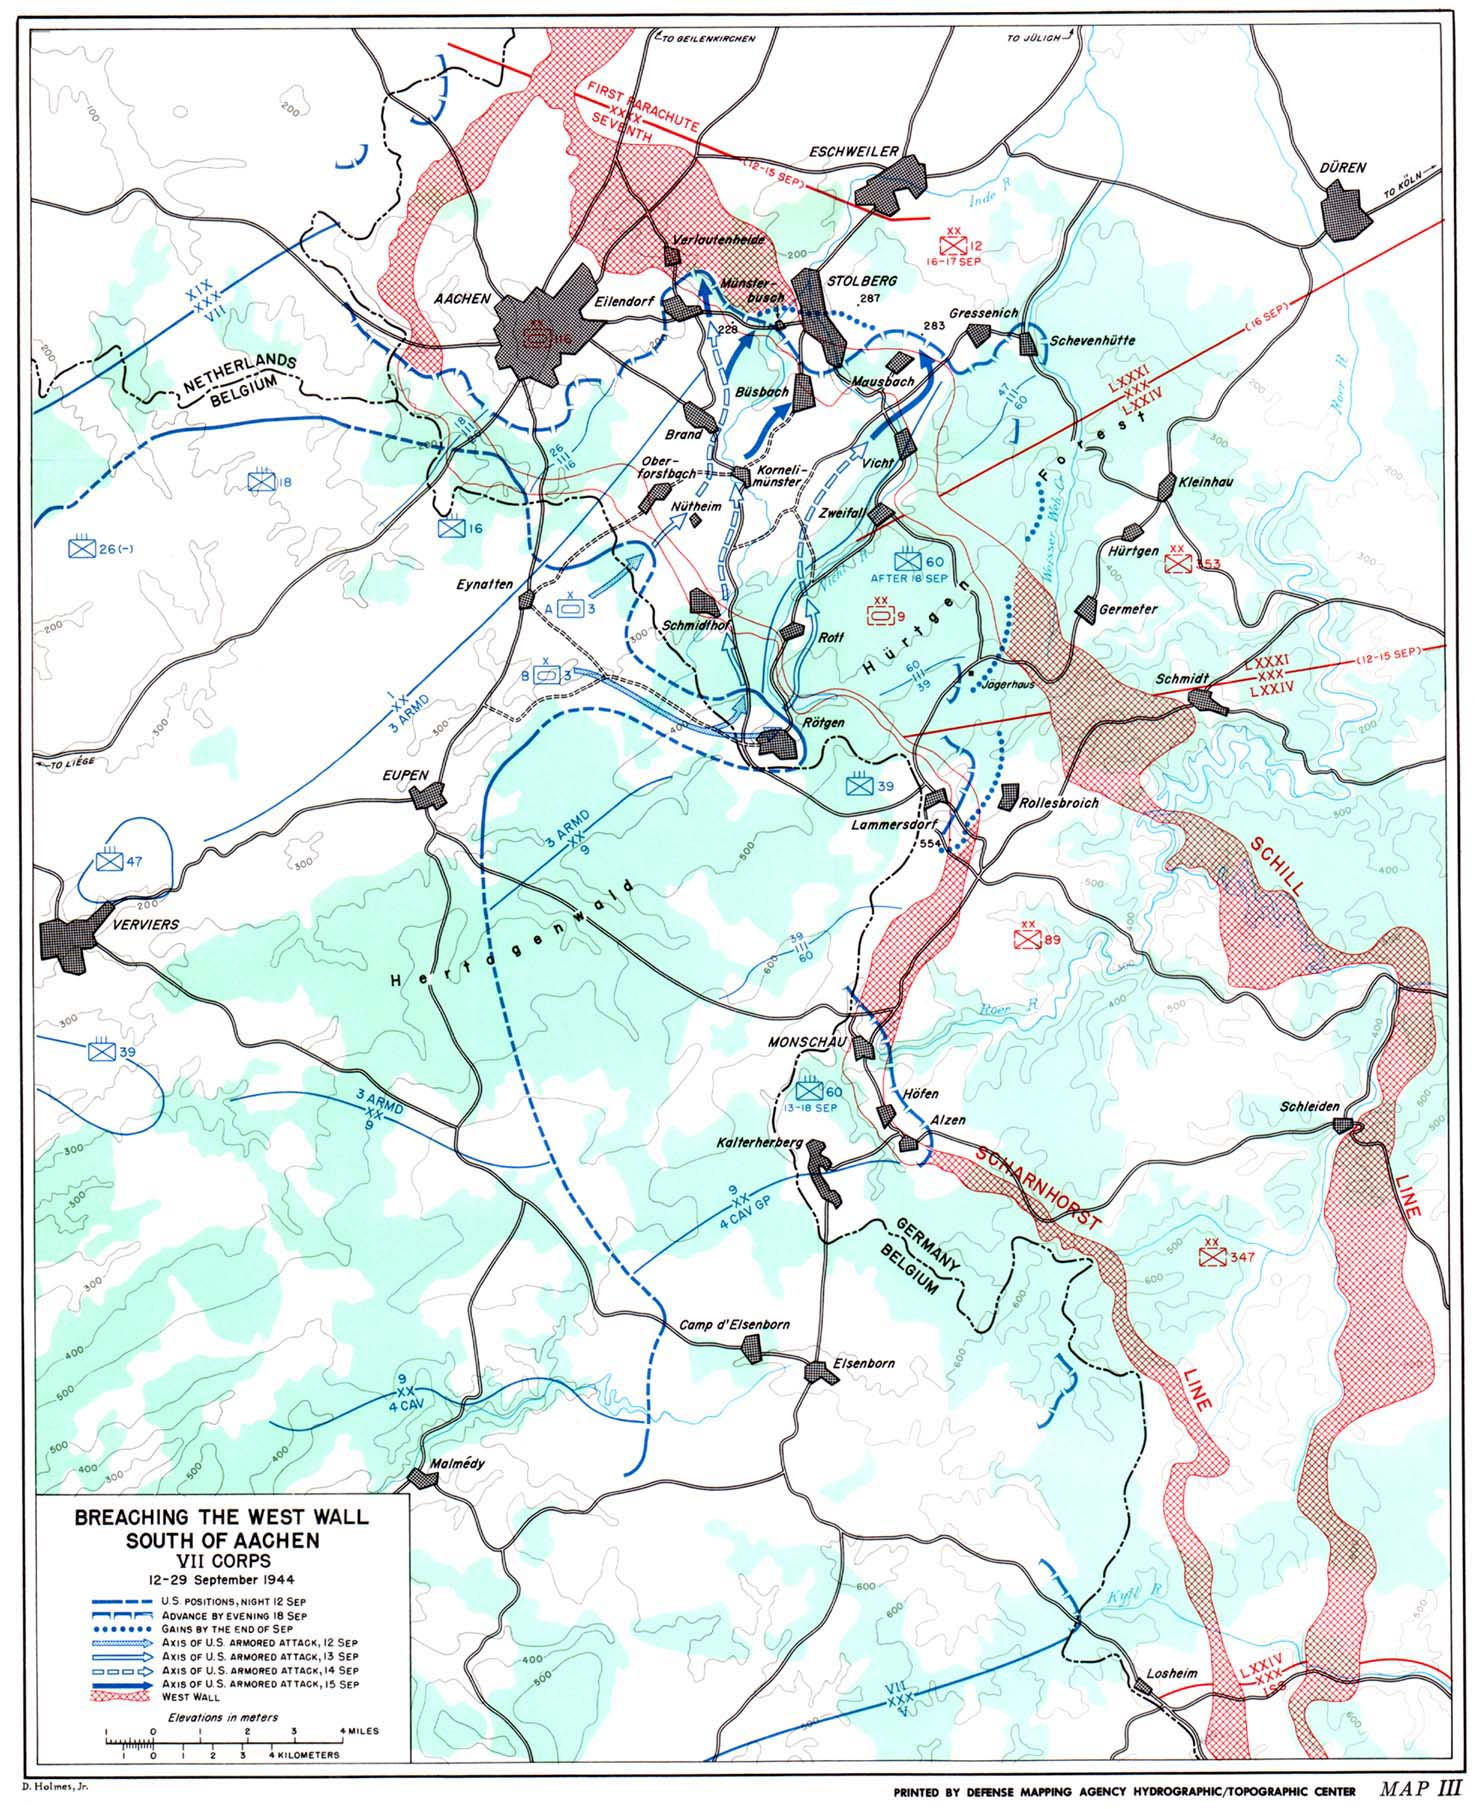 The Siegfried Line Campaign: Maps